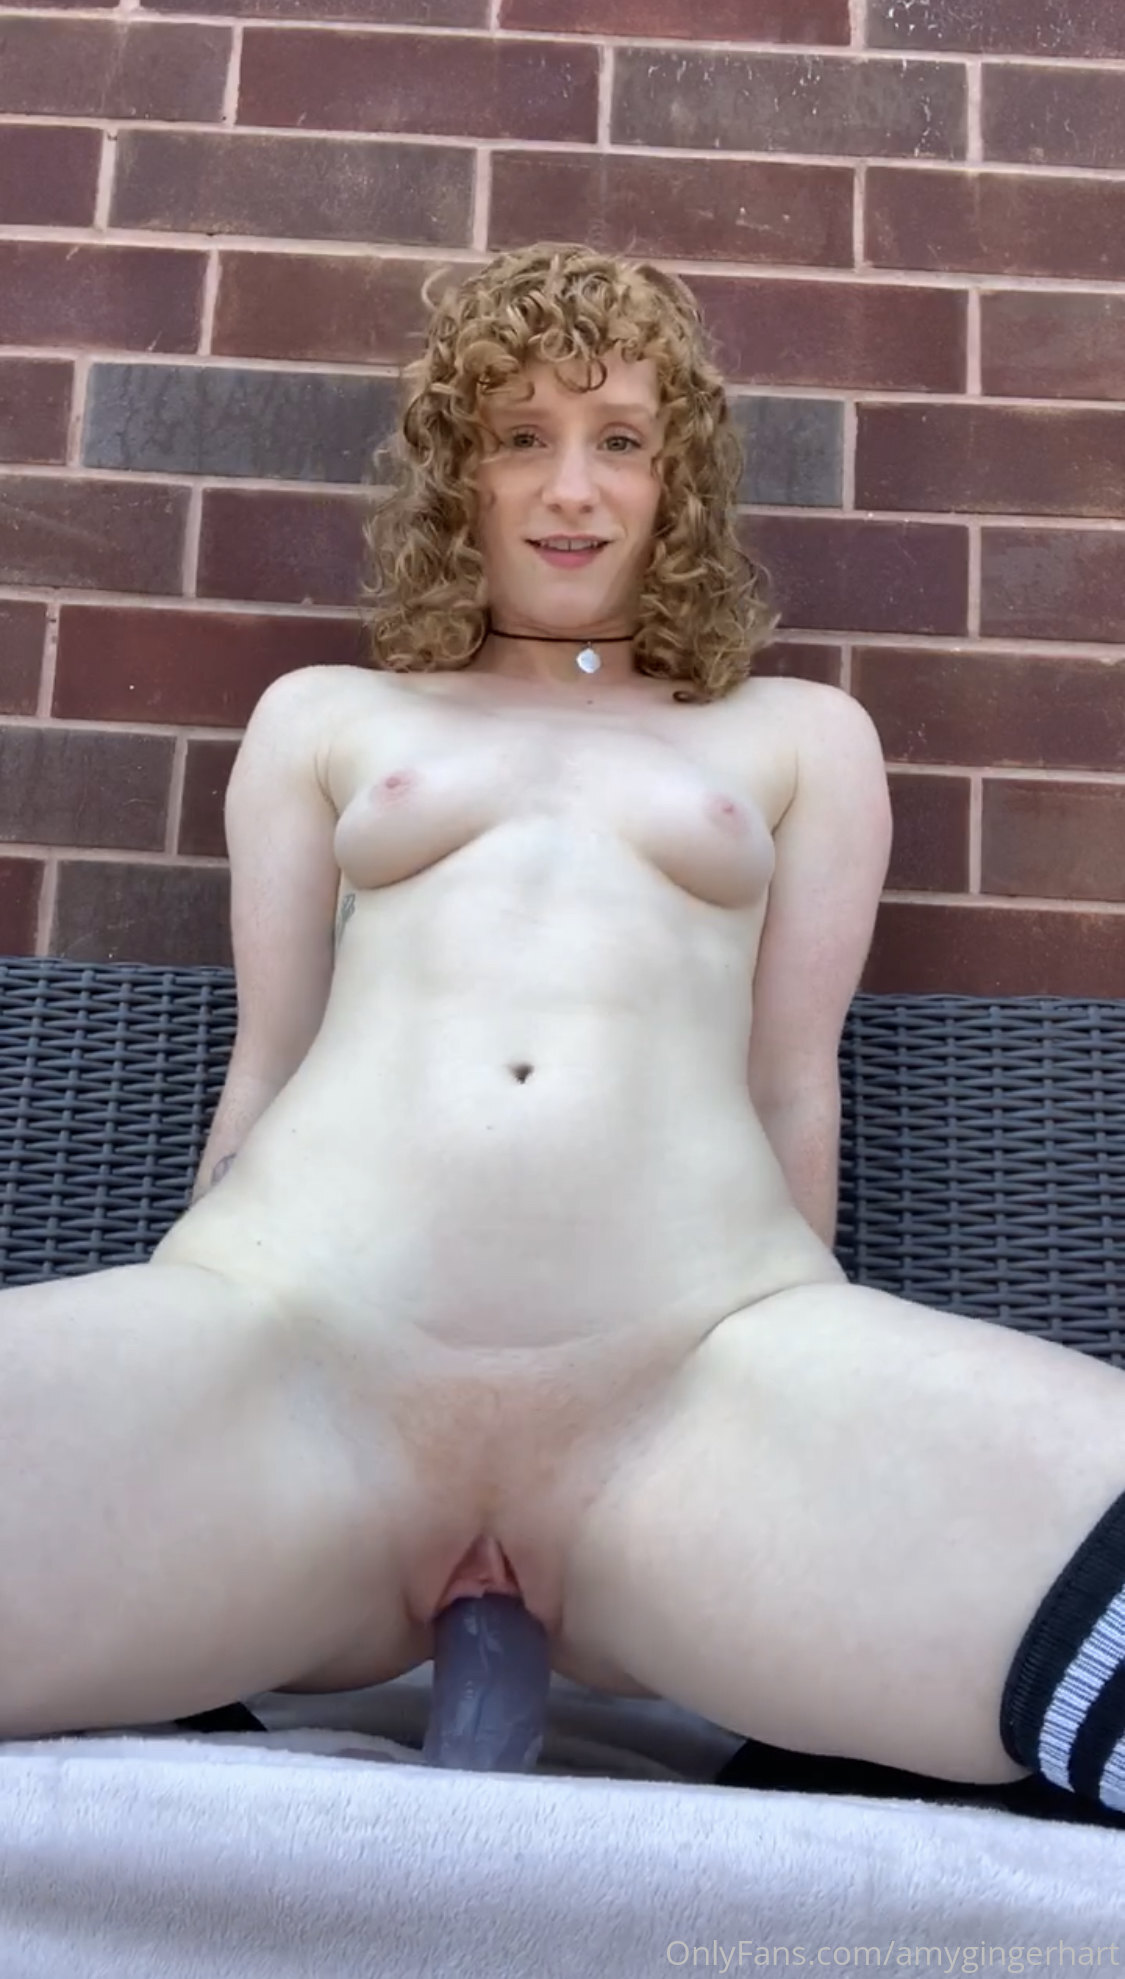 Amy Hart, Amygingerhart, Onlyfans 0173